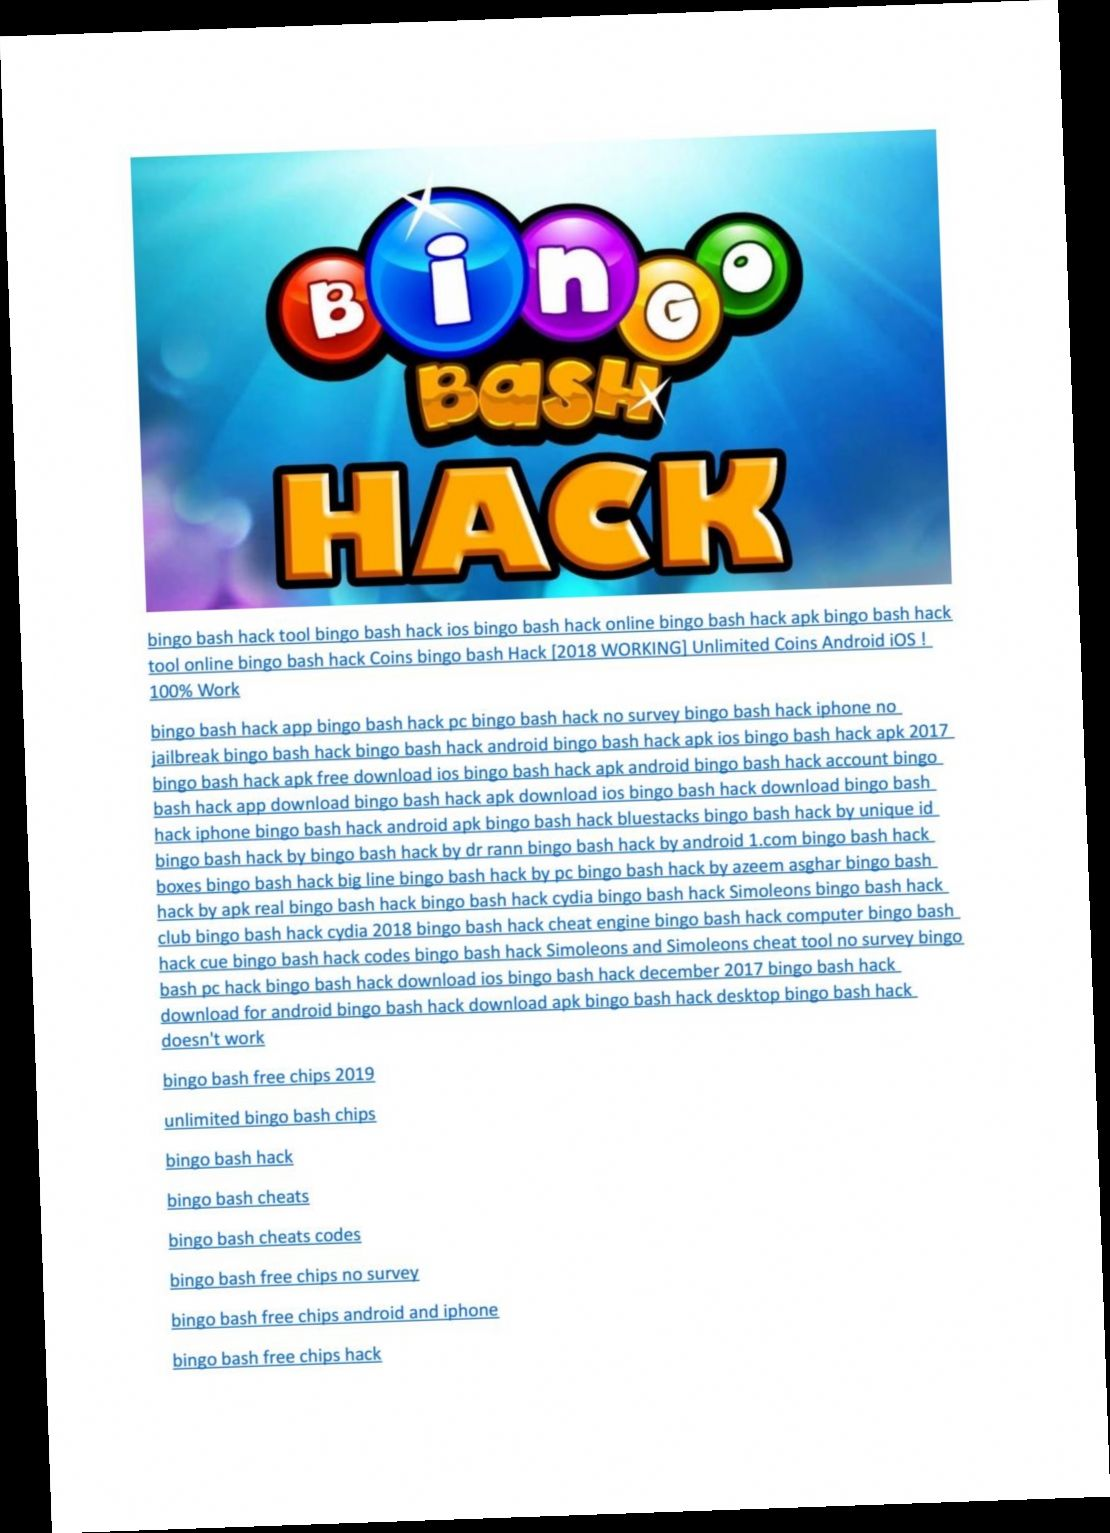 bingo bash iphone hack no survey в 2020 г